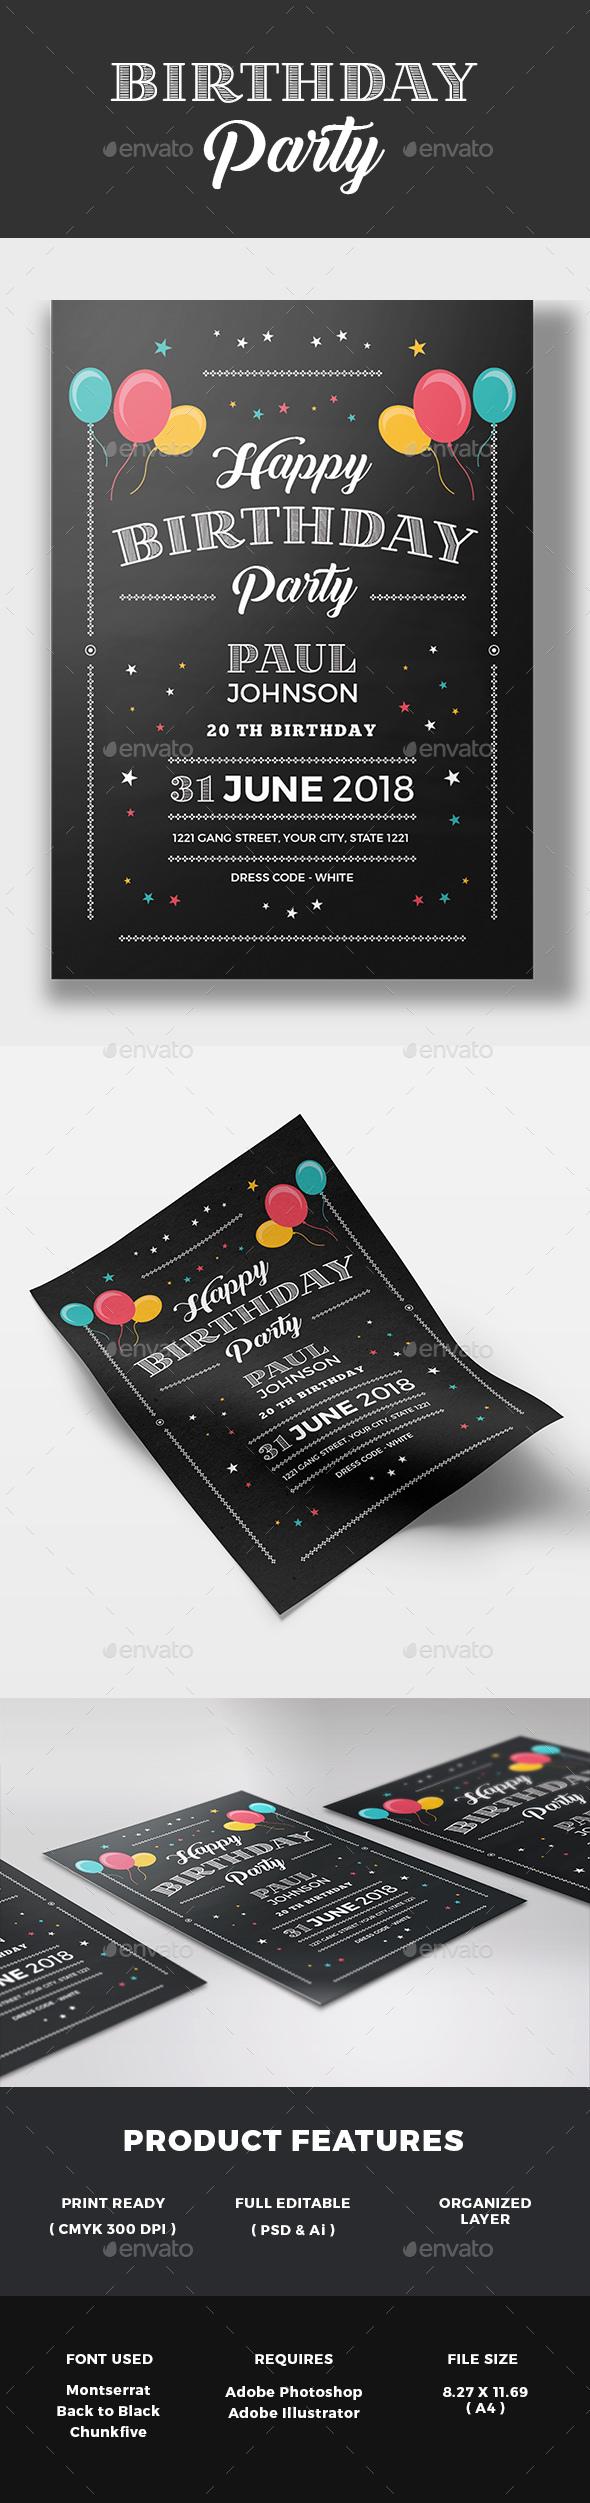 Chalkboard Birthday Invitation - Invitations Cards & Invites